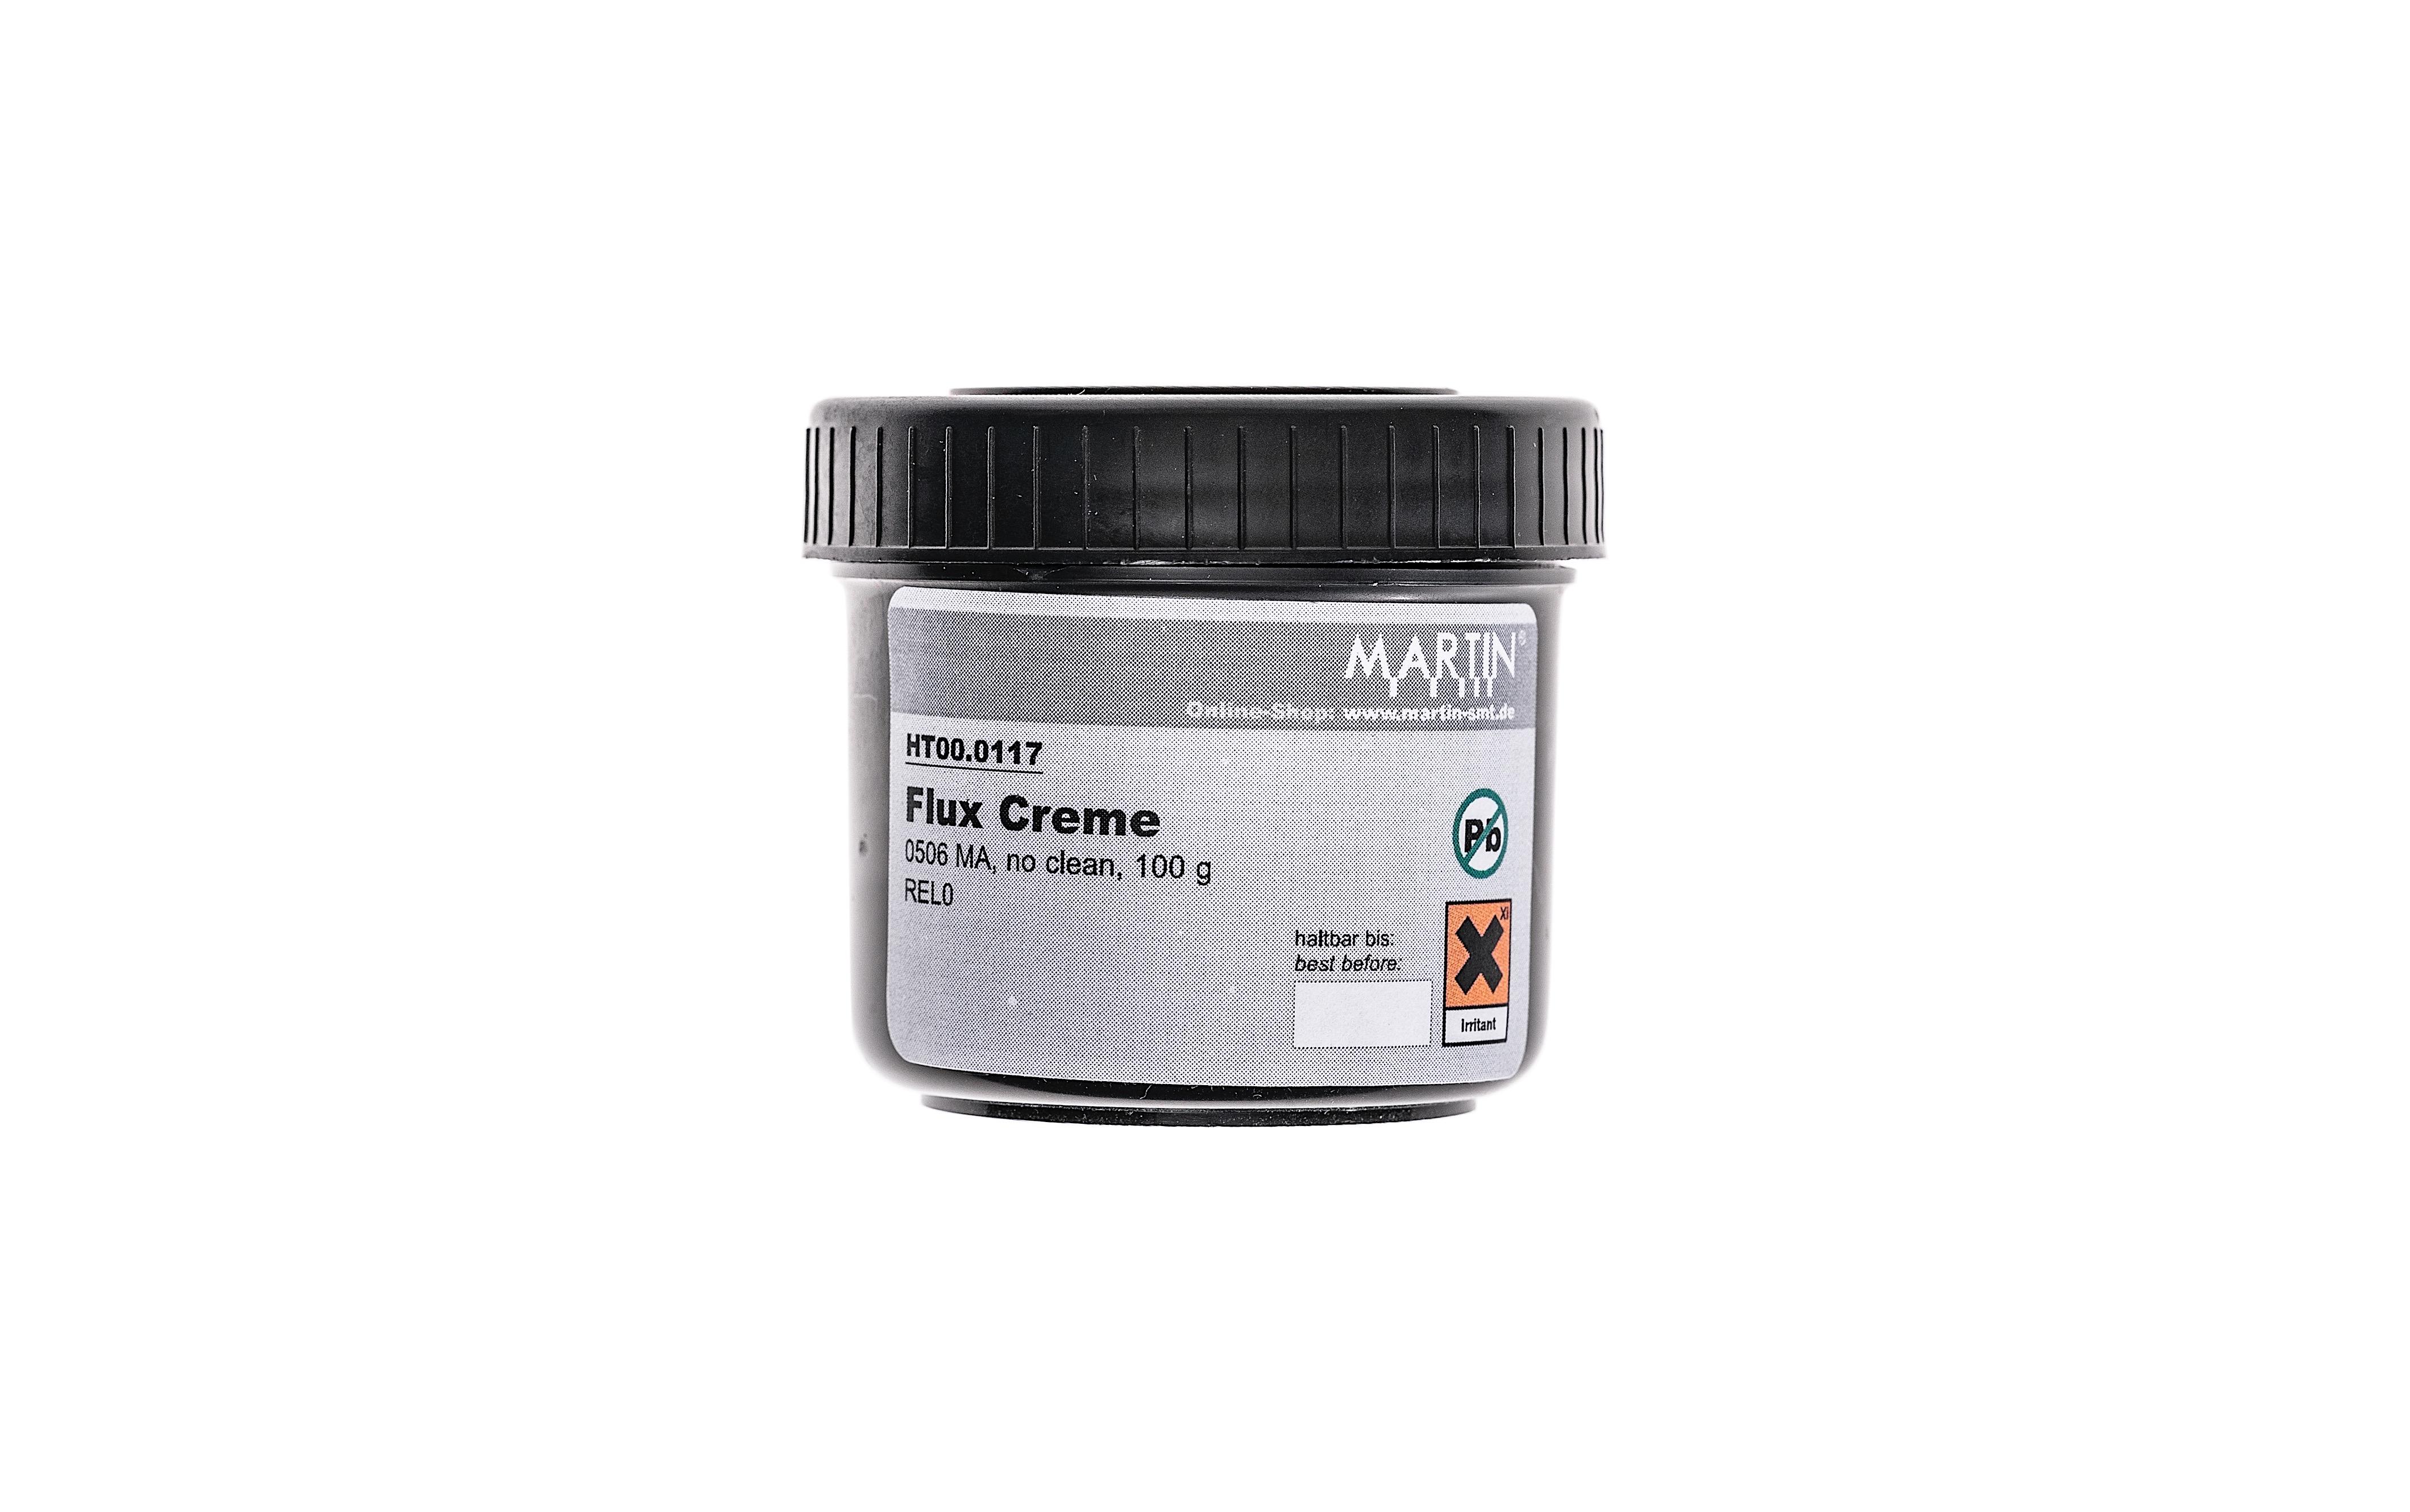 Flux Creme lead free 100g